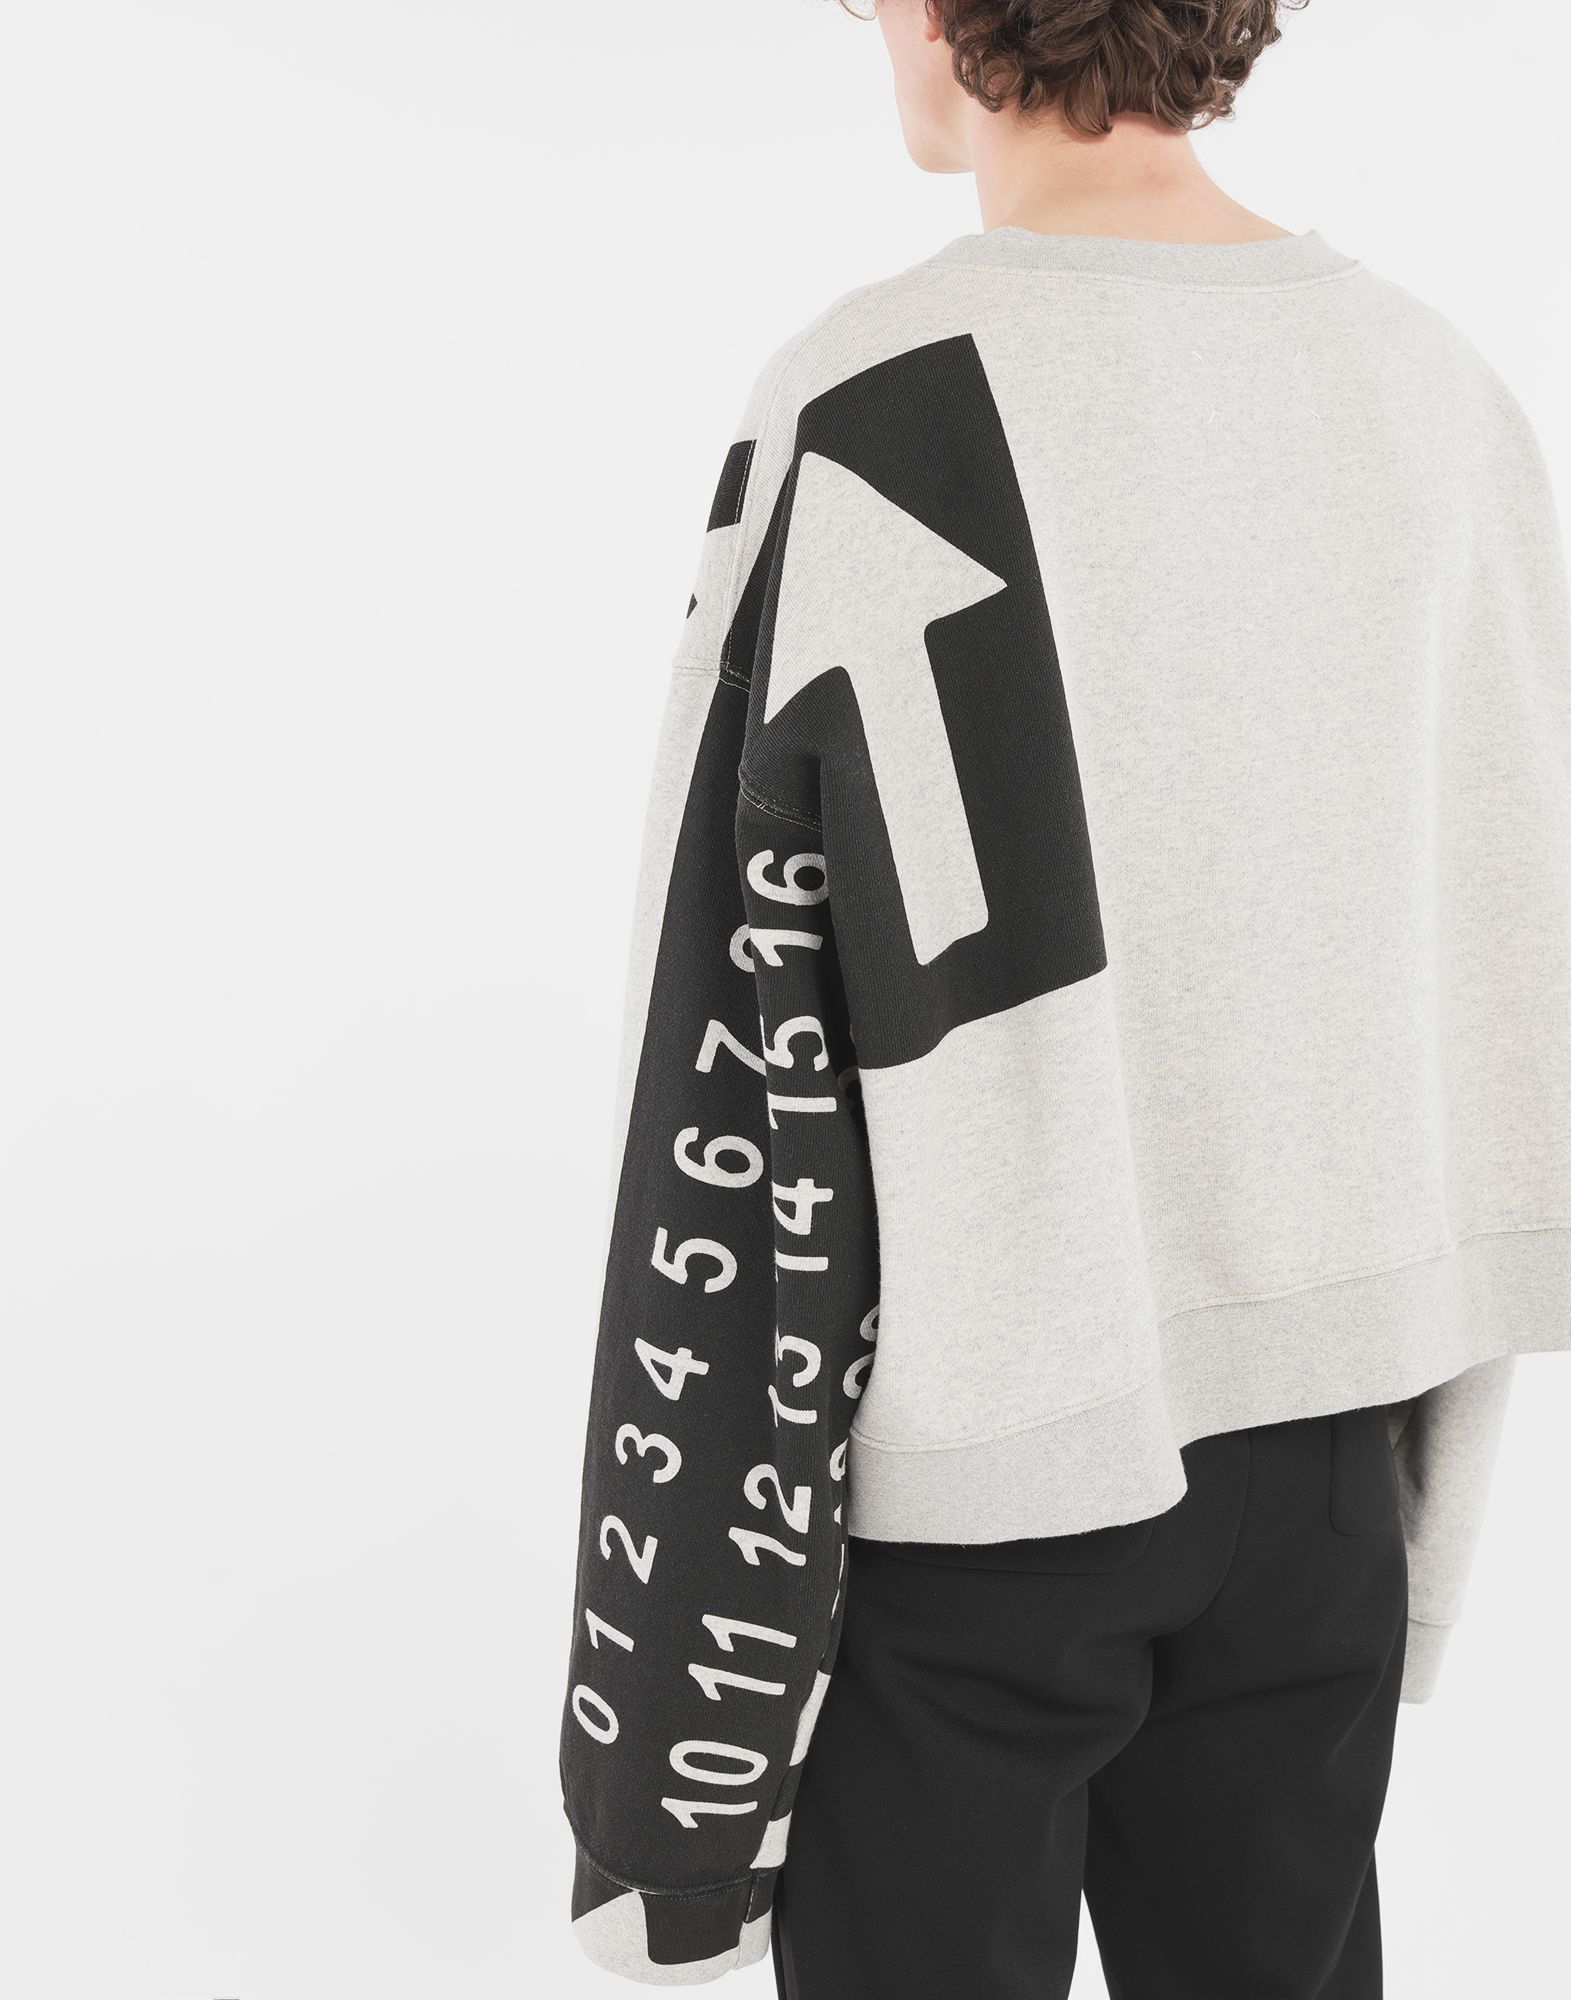 MAISON MARGIELA 'Fragile' sweatshirt Sweatshirt Man b